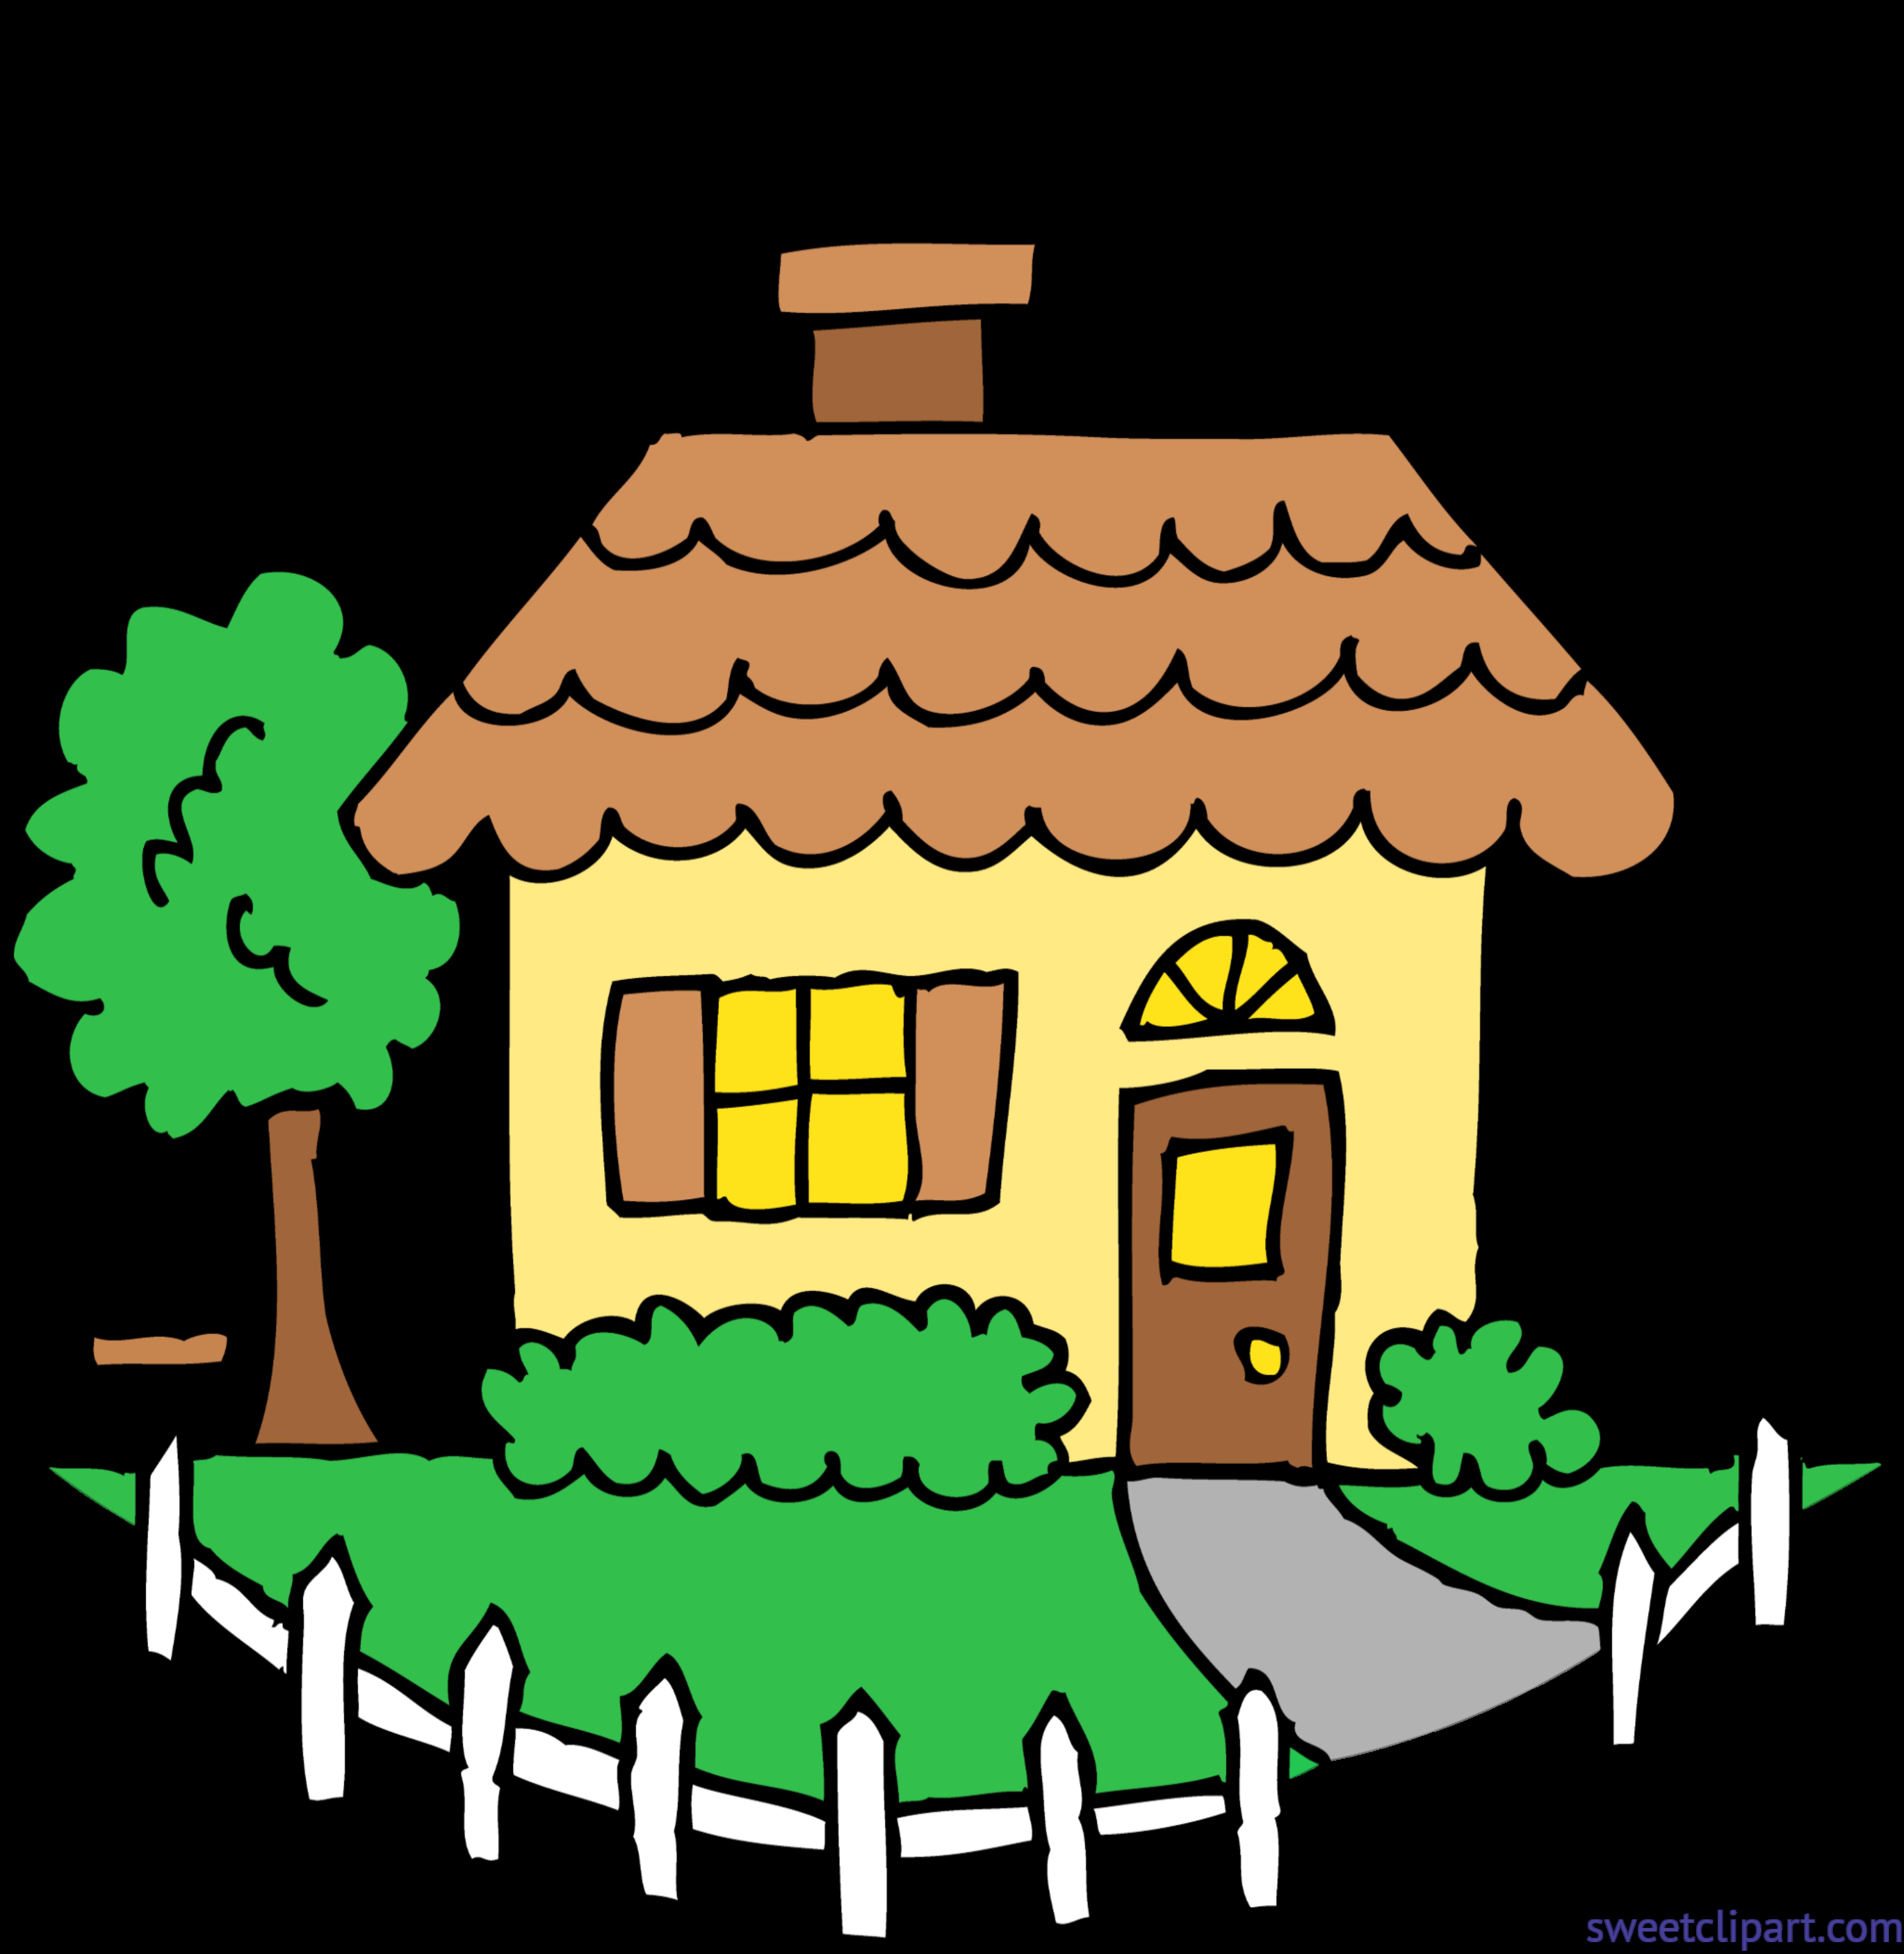 Cute yellow house.